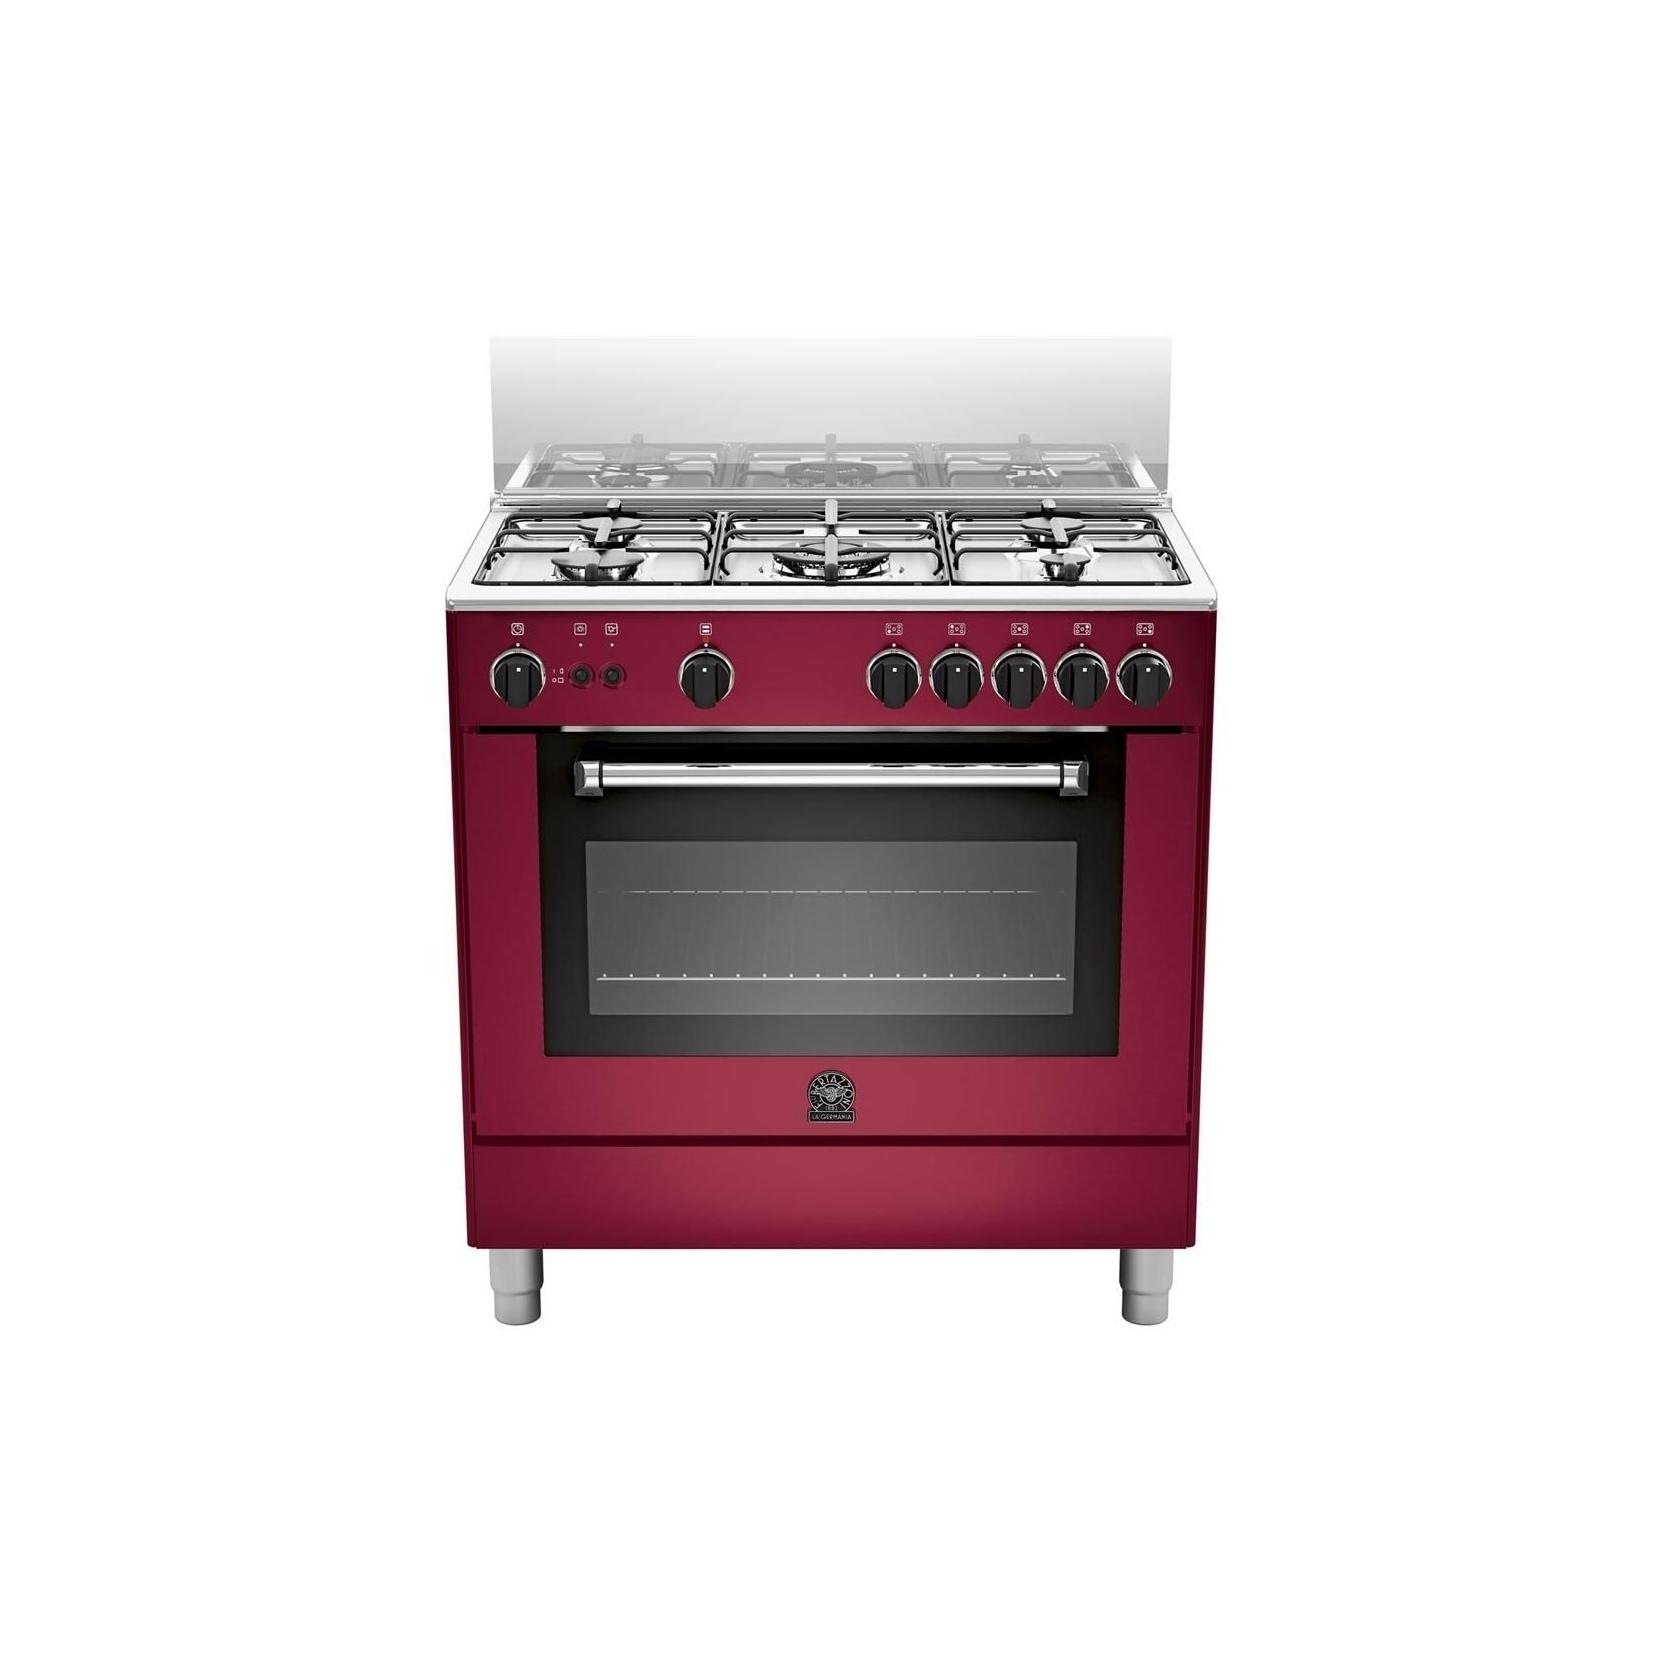 Cucina a gas la germania am85c71cvi 5 fuochi a gas forno a - Cucina con forno a gas ...